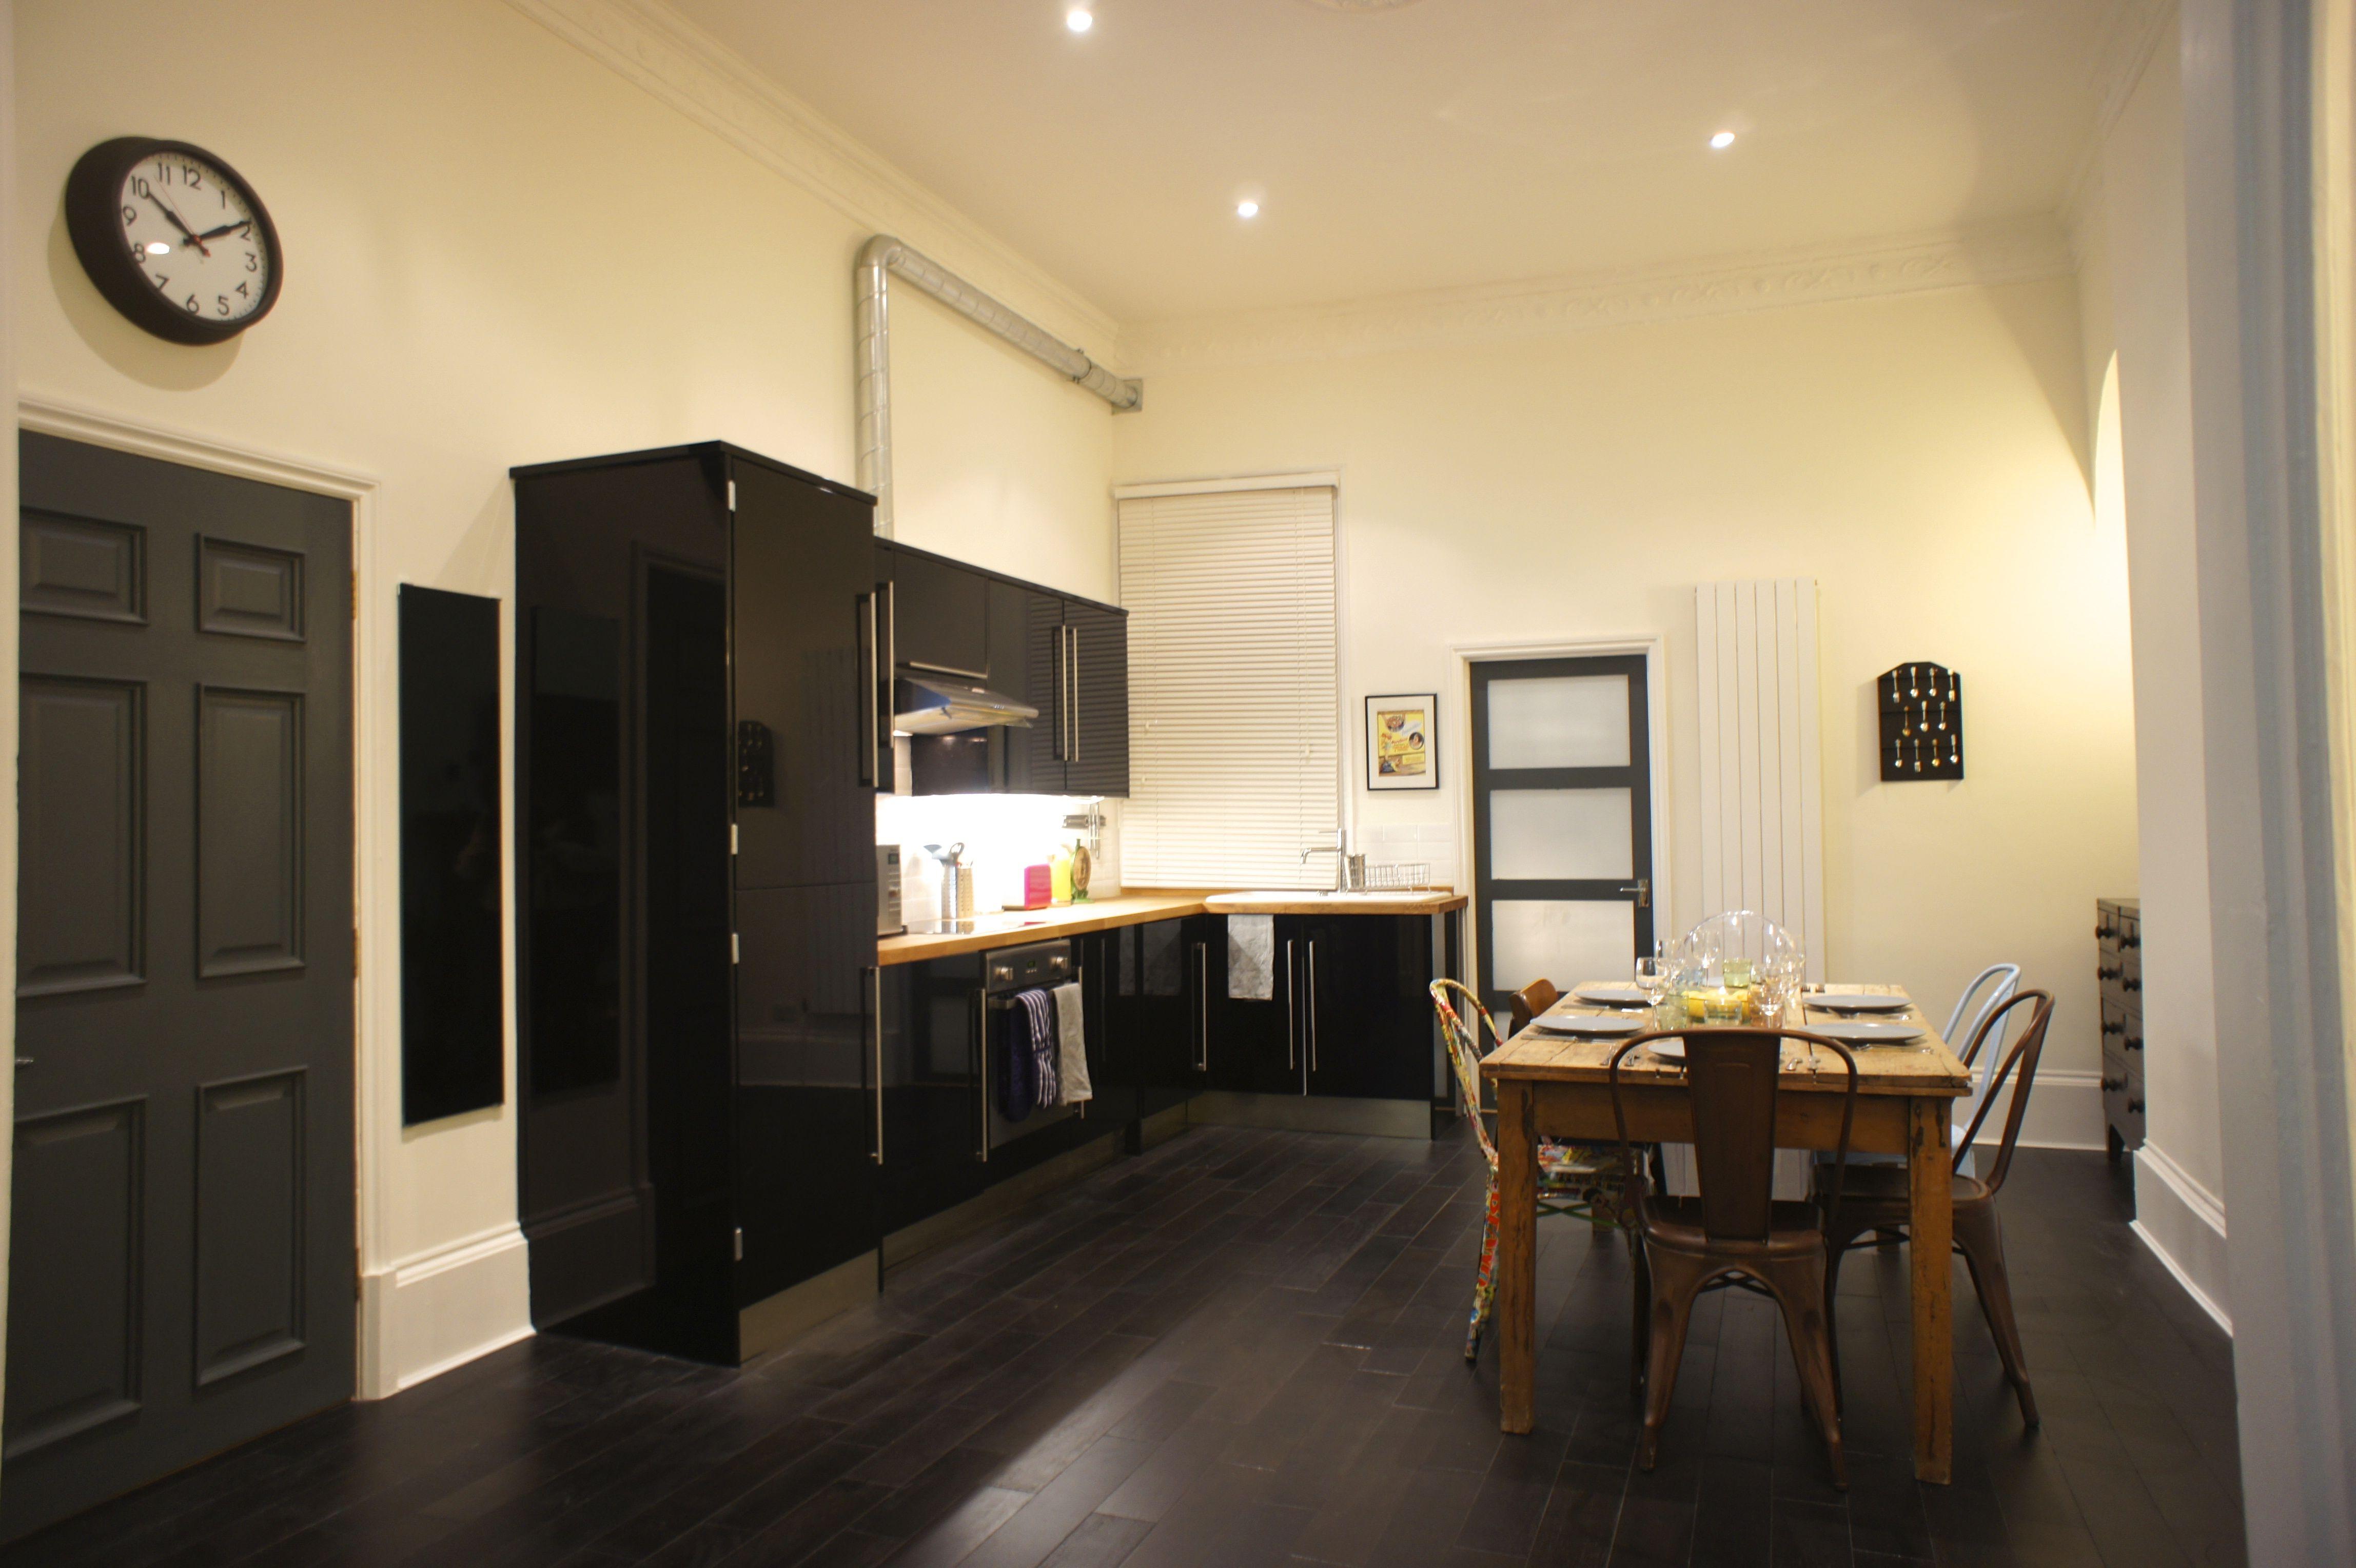 Black gloss kitchen, dark floors, farmer table, mismatched